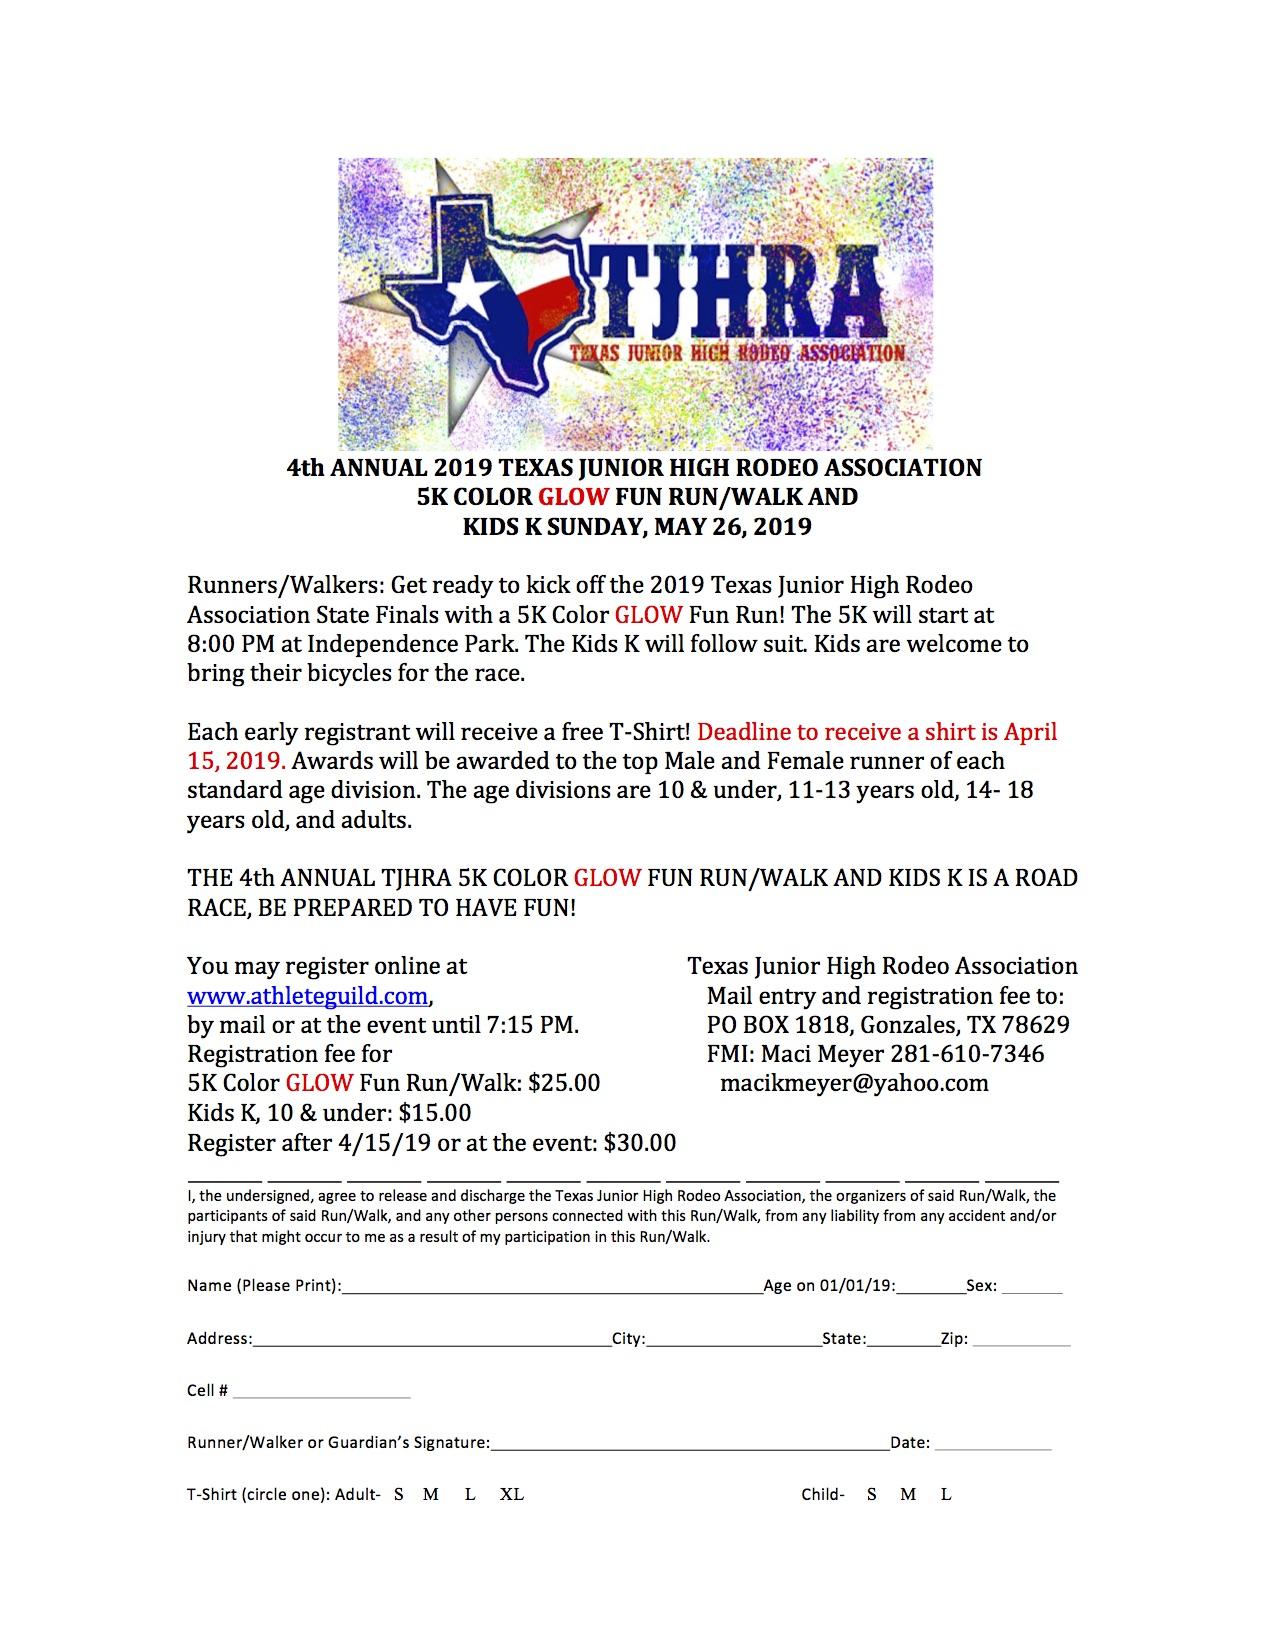 Forms Amp Finals Texas Junior High Rodeo Association